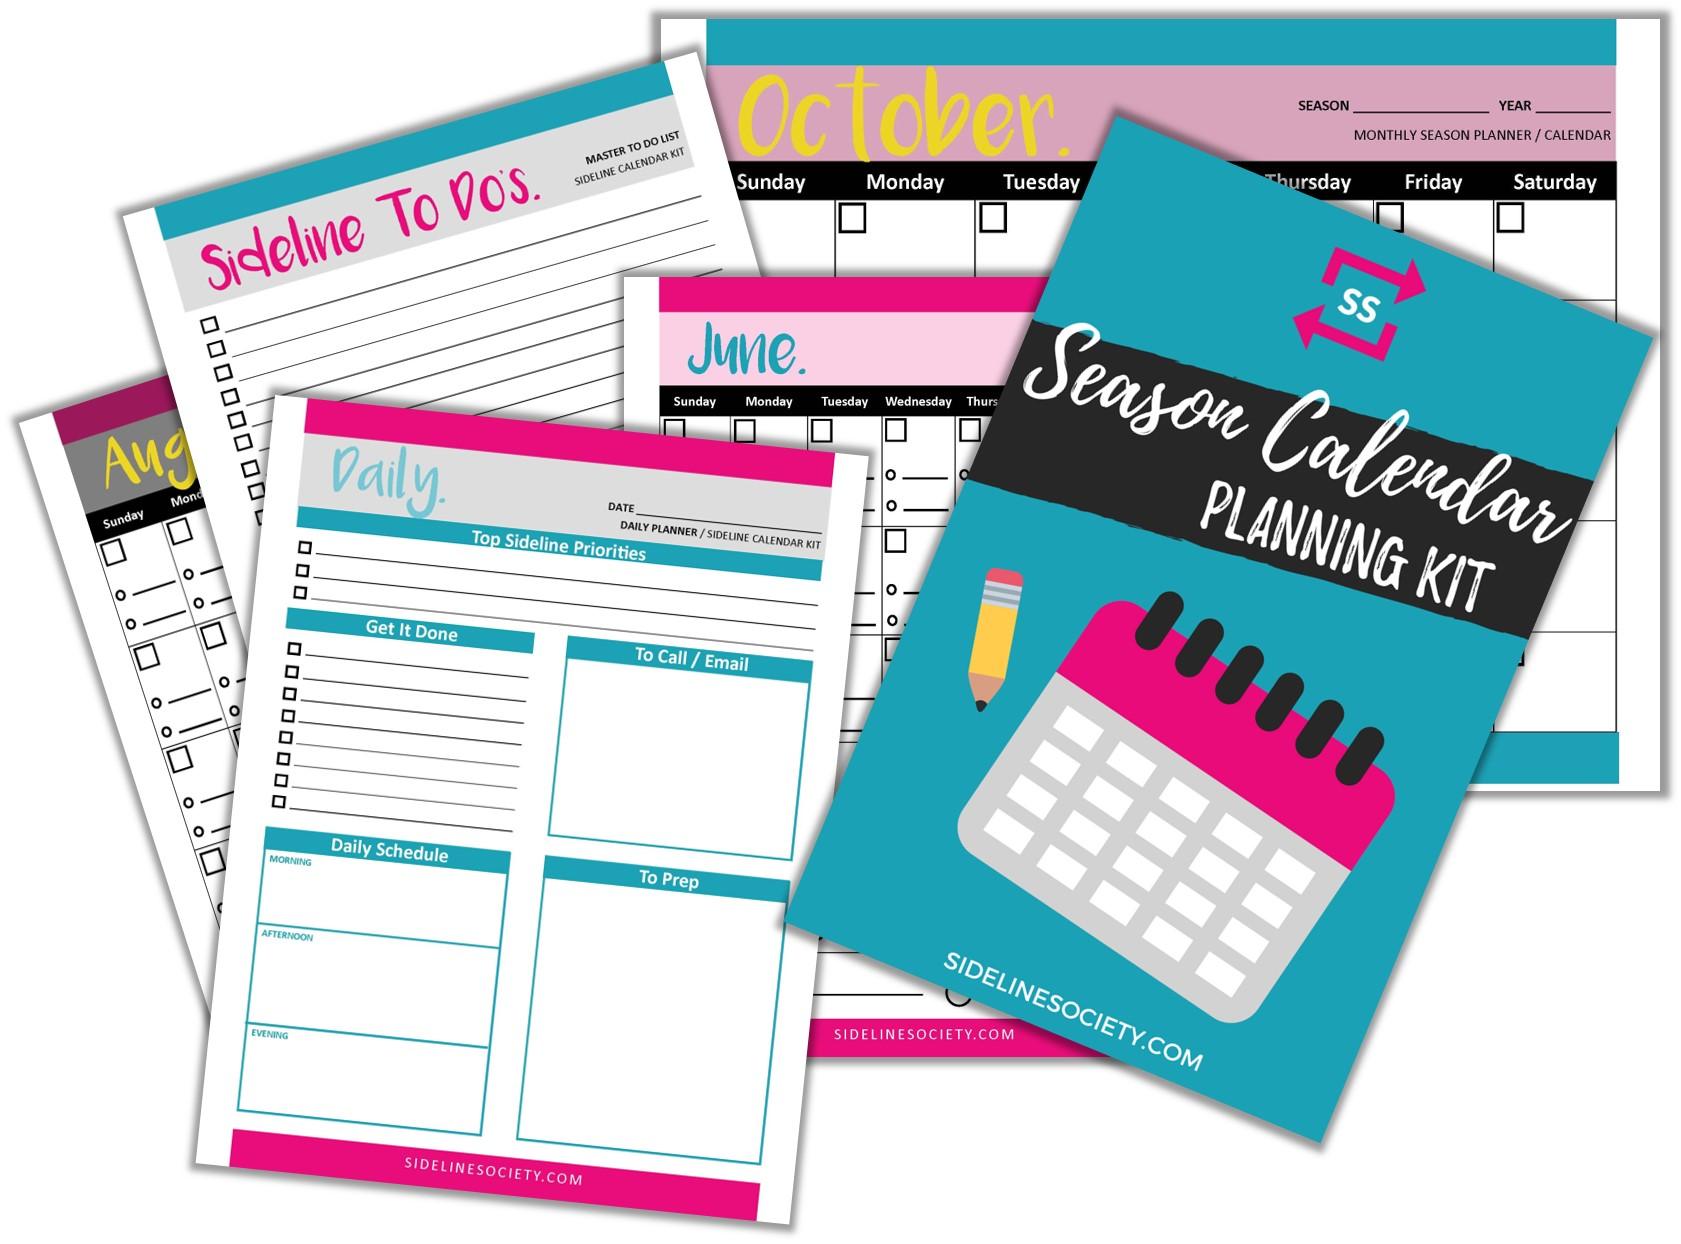 Season Calendar Kit Thumbnail.jpg